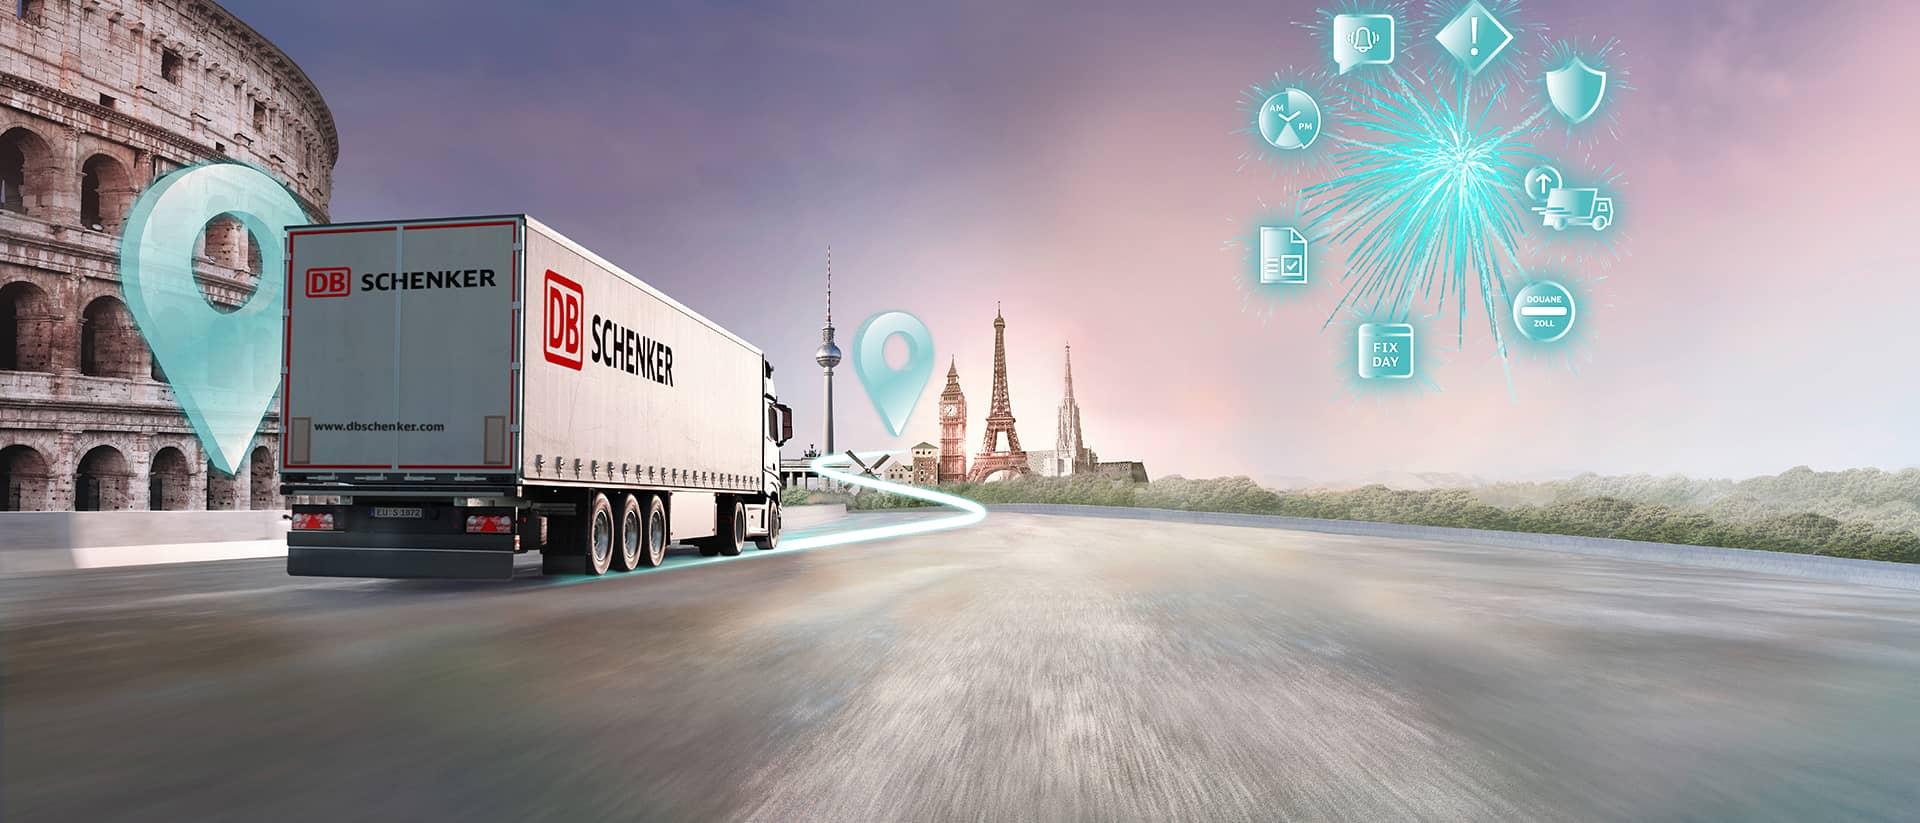 DB Schenker UK | Global Logistics Solutions & Supply Chain